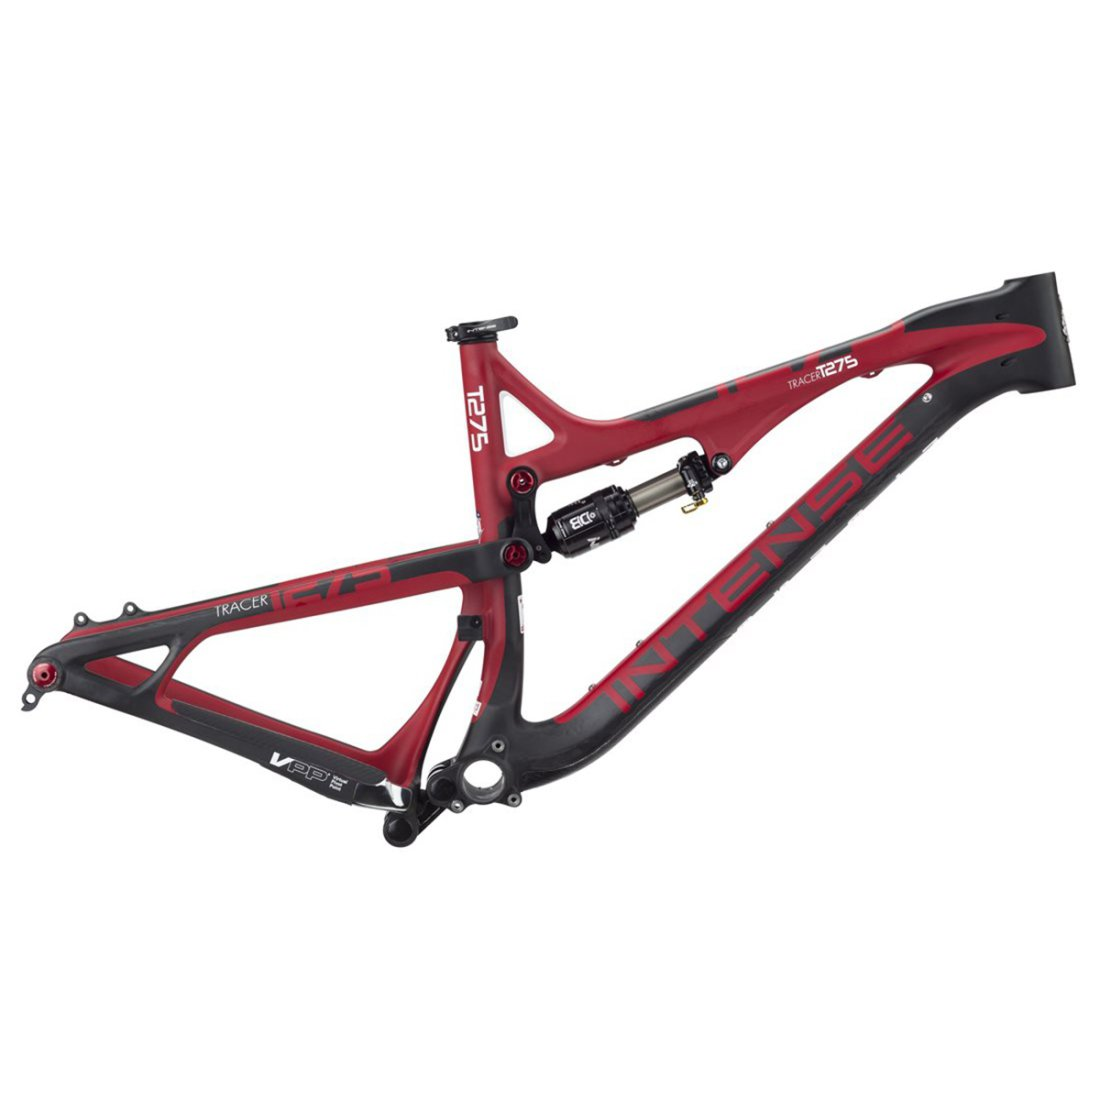 Fahrradrahmen INTENSE Tracer 275C 2015 Red · Motocard